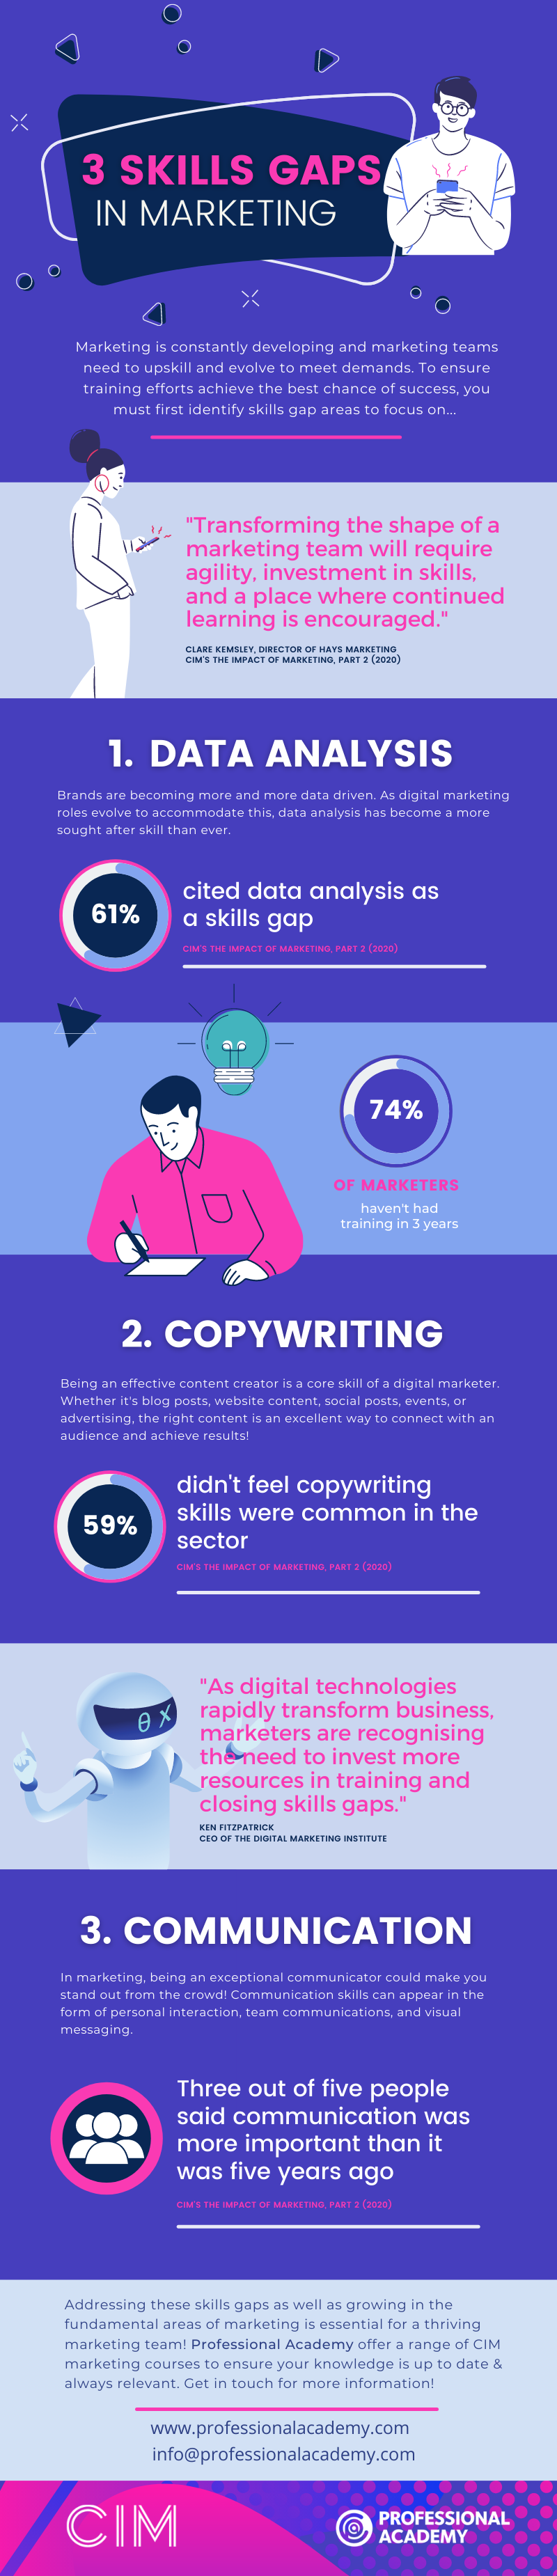 Marketing Skills Gaps Infographic - CIM survey